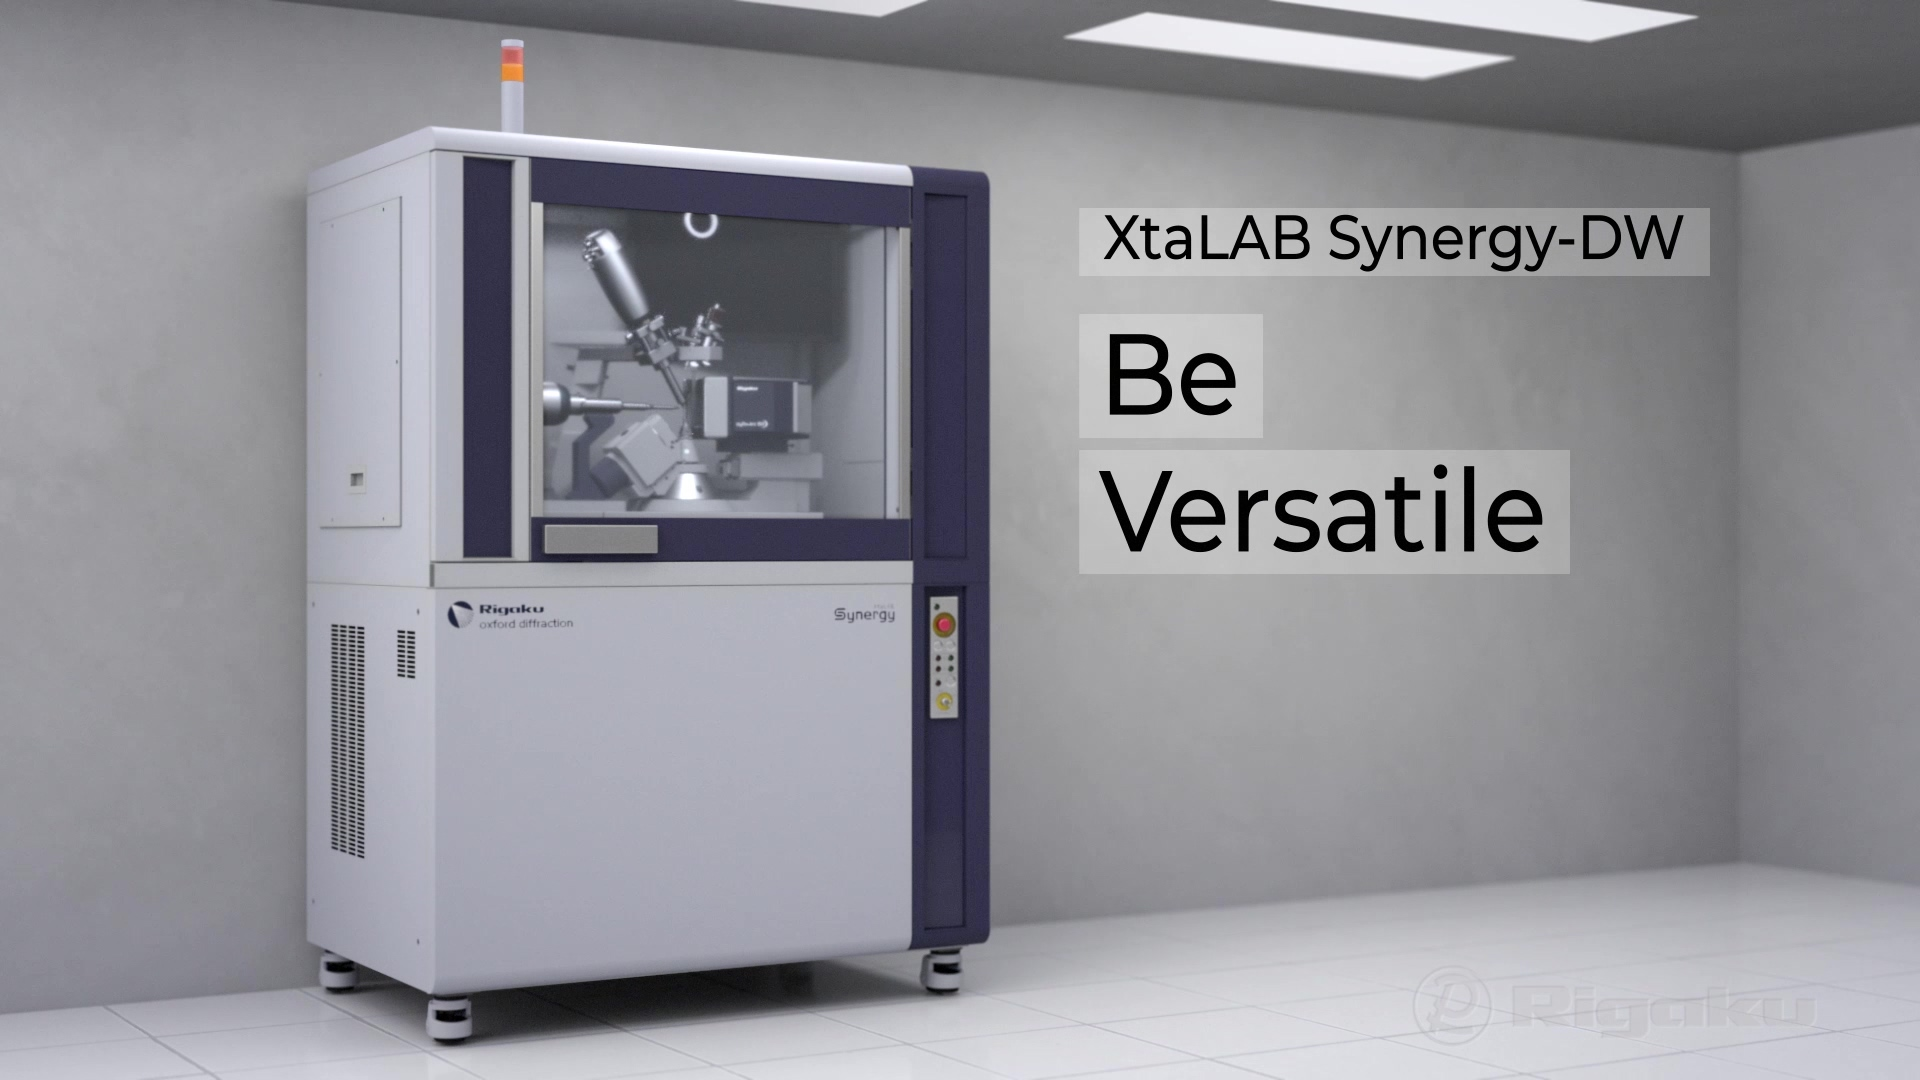 XtaLAB Synergy DW_video_en_Ver2_2019.04.05